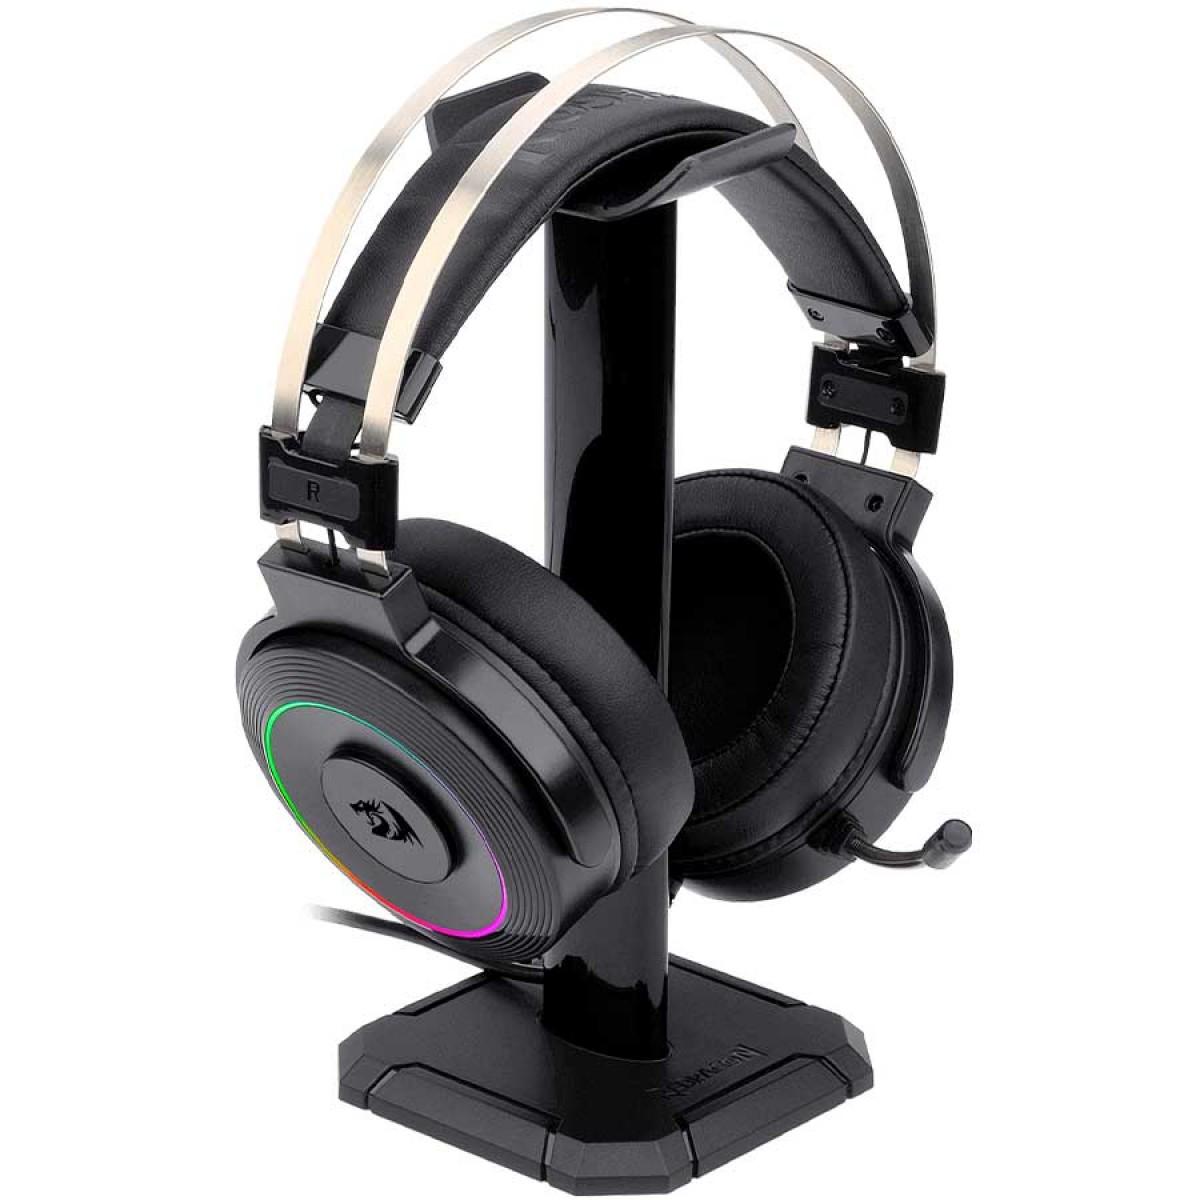 Headset Gamer Redragon Lamia 2 H320 RGB, Drivers 40mm, Surround 7.1, Preto